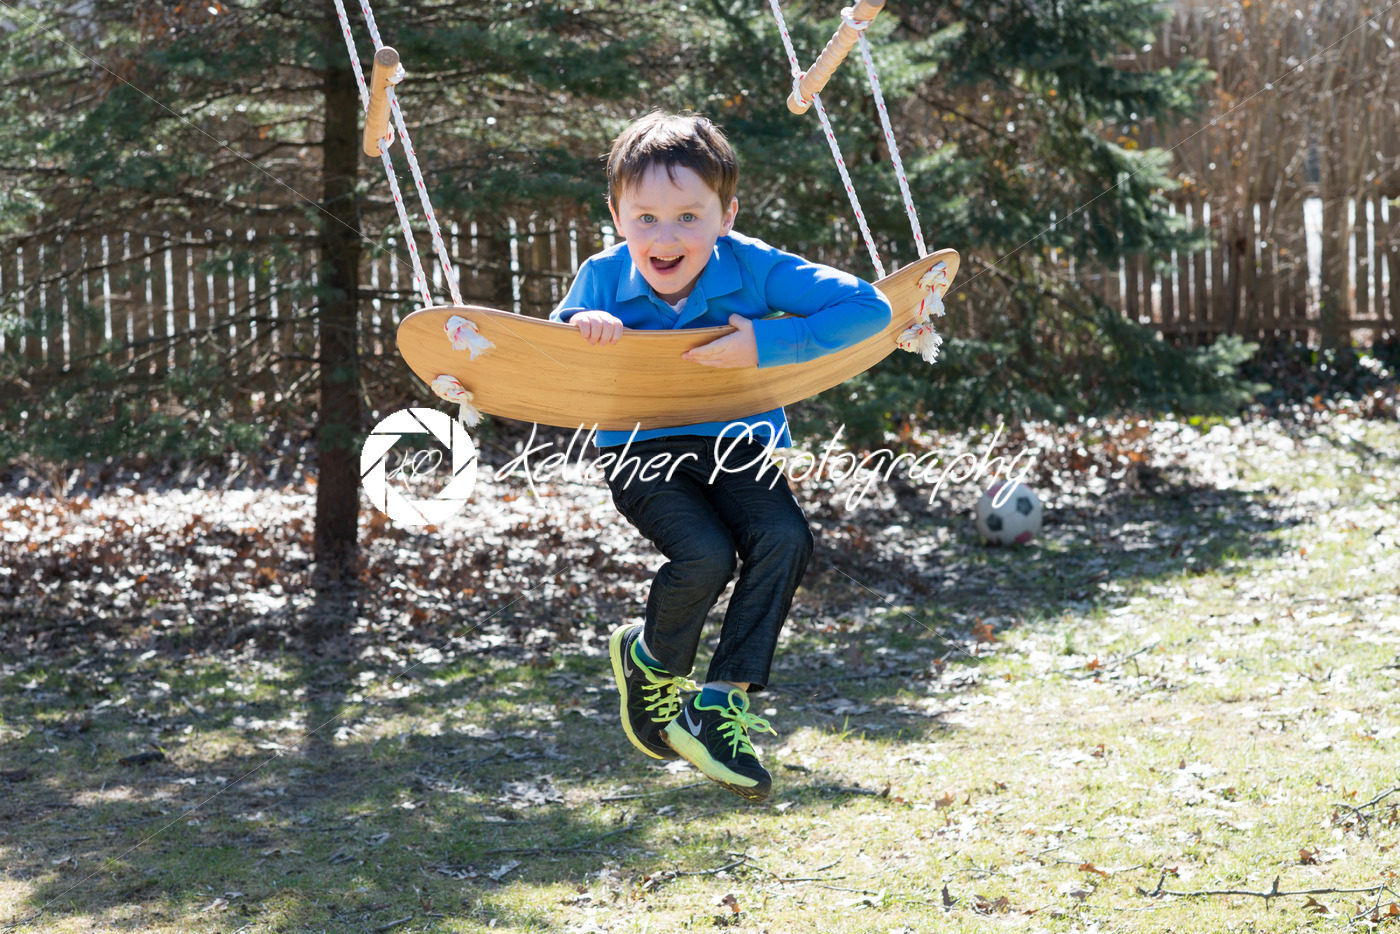 Young boy outside in backyard having fun on a swing - Kelleher Photography Store